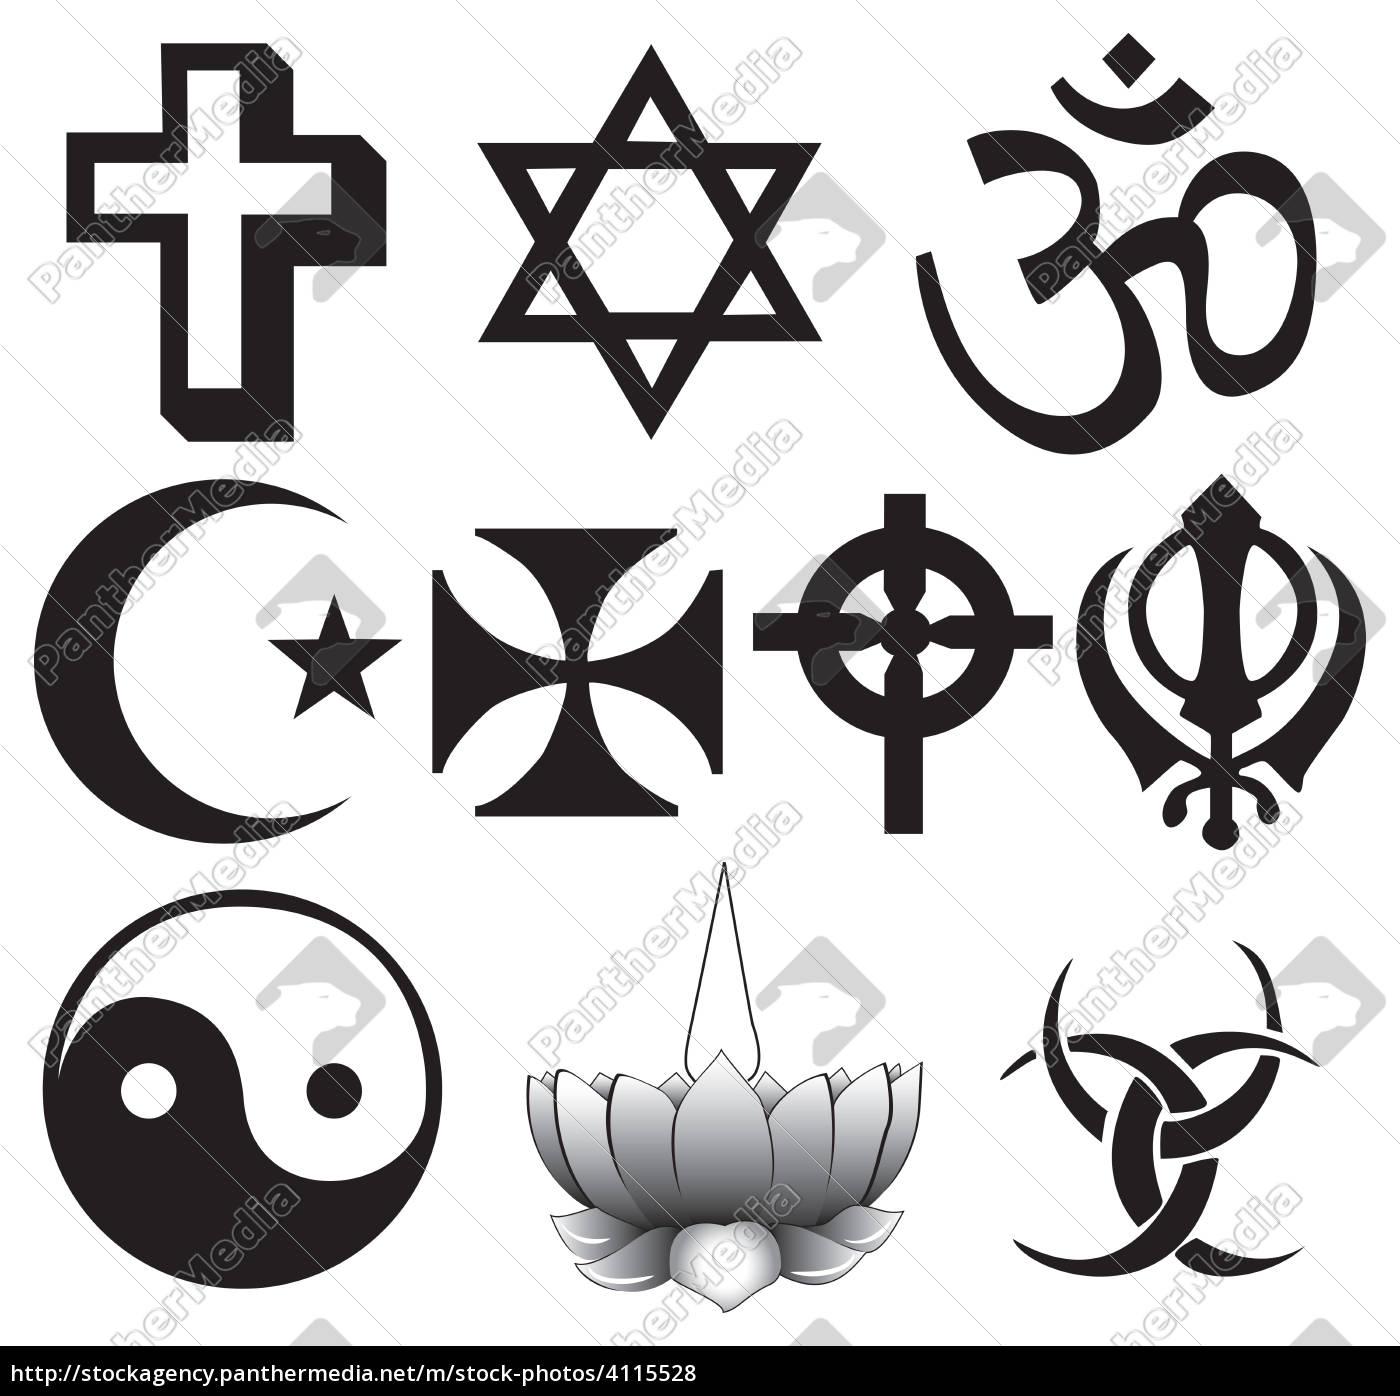 verschiedene religionen symbole - Lizenzfreies Foto - #4115528 ...